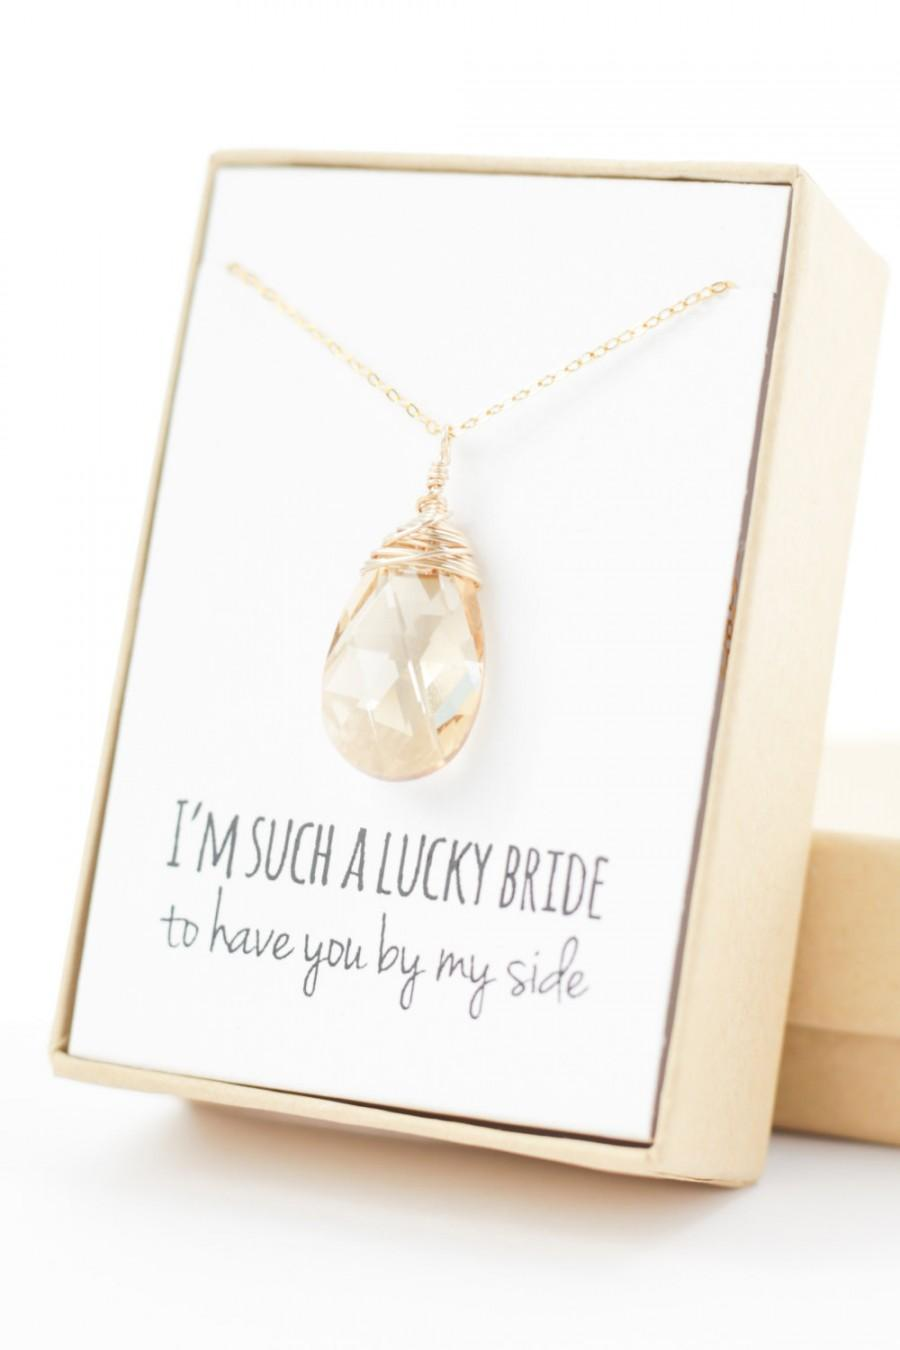 Hochzeit - Champagne Gold Swarovski Necklace - Large Crystal Necklace - Champagne Swarovski Necklace - Wire-Wrapped - Bridesmaid Necklace Gift